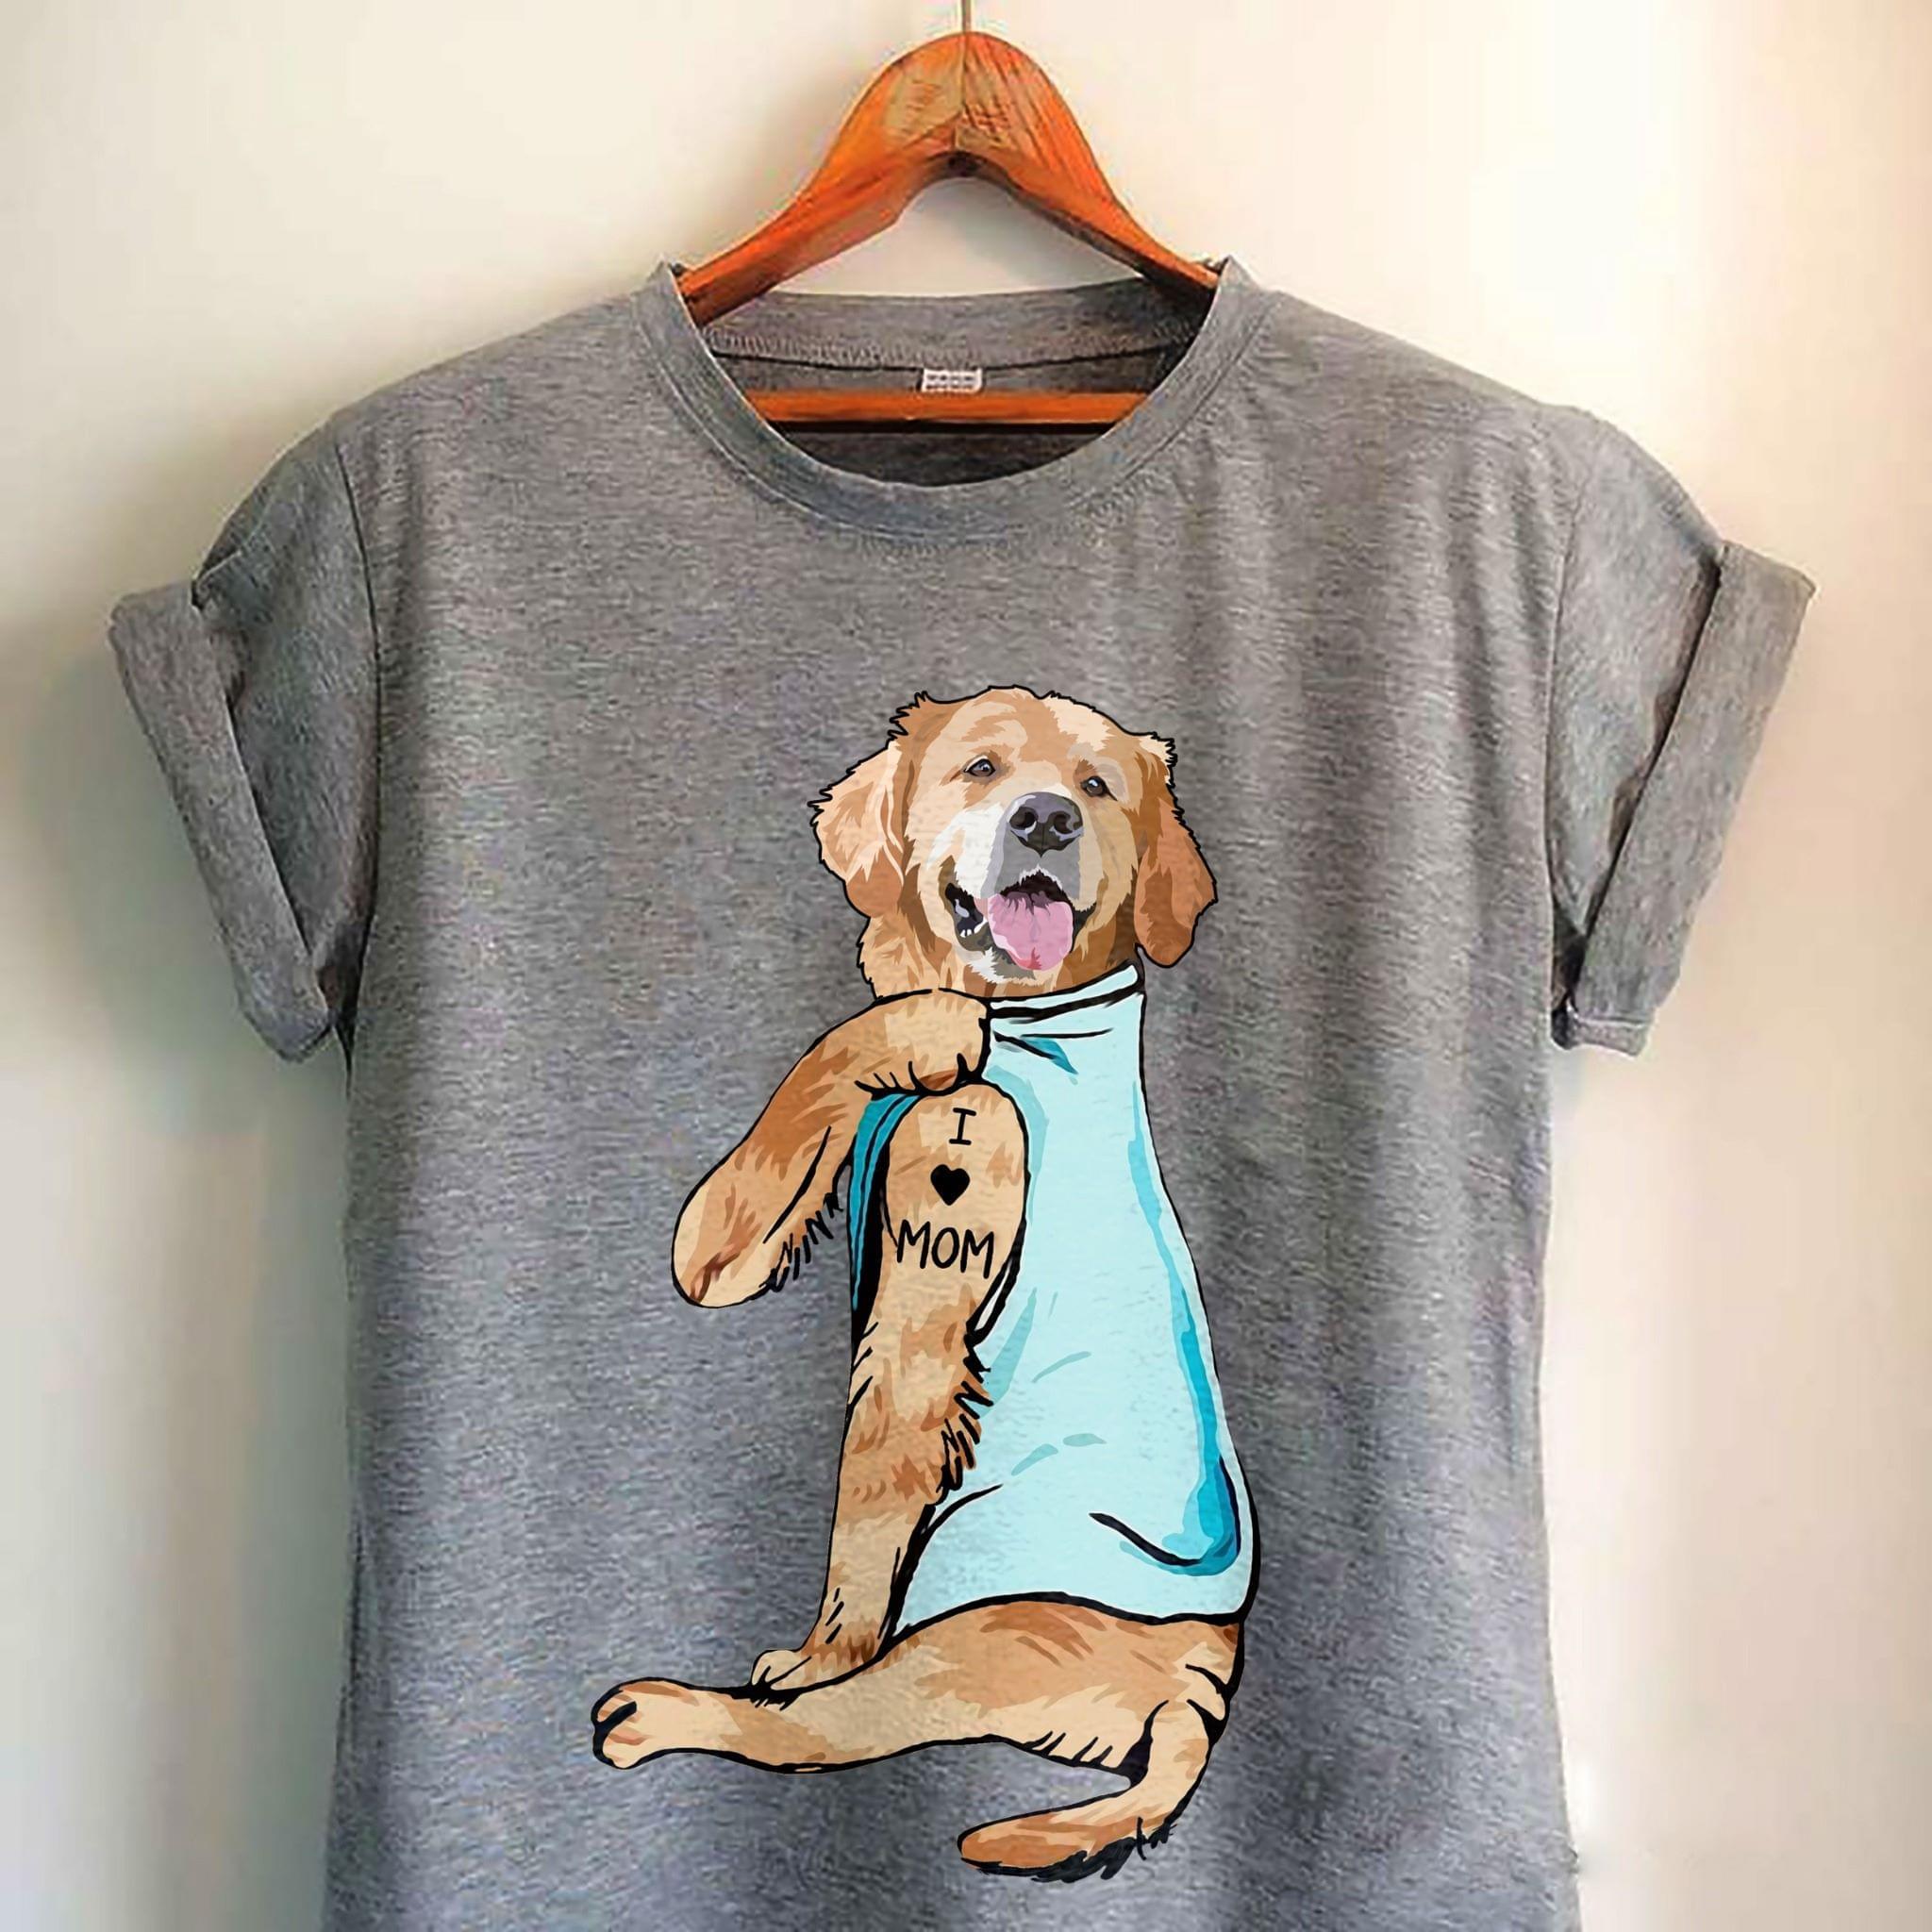 Golden Retriever I Love Mom Cute Art For Dogs Lovers cotton t-shirt Hoodie Mug